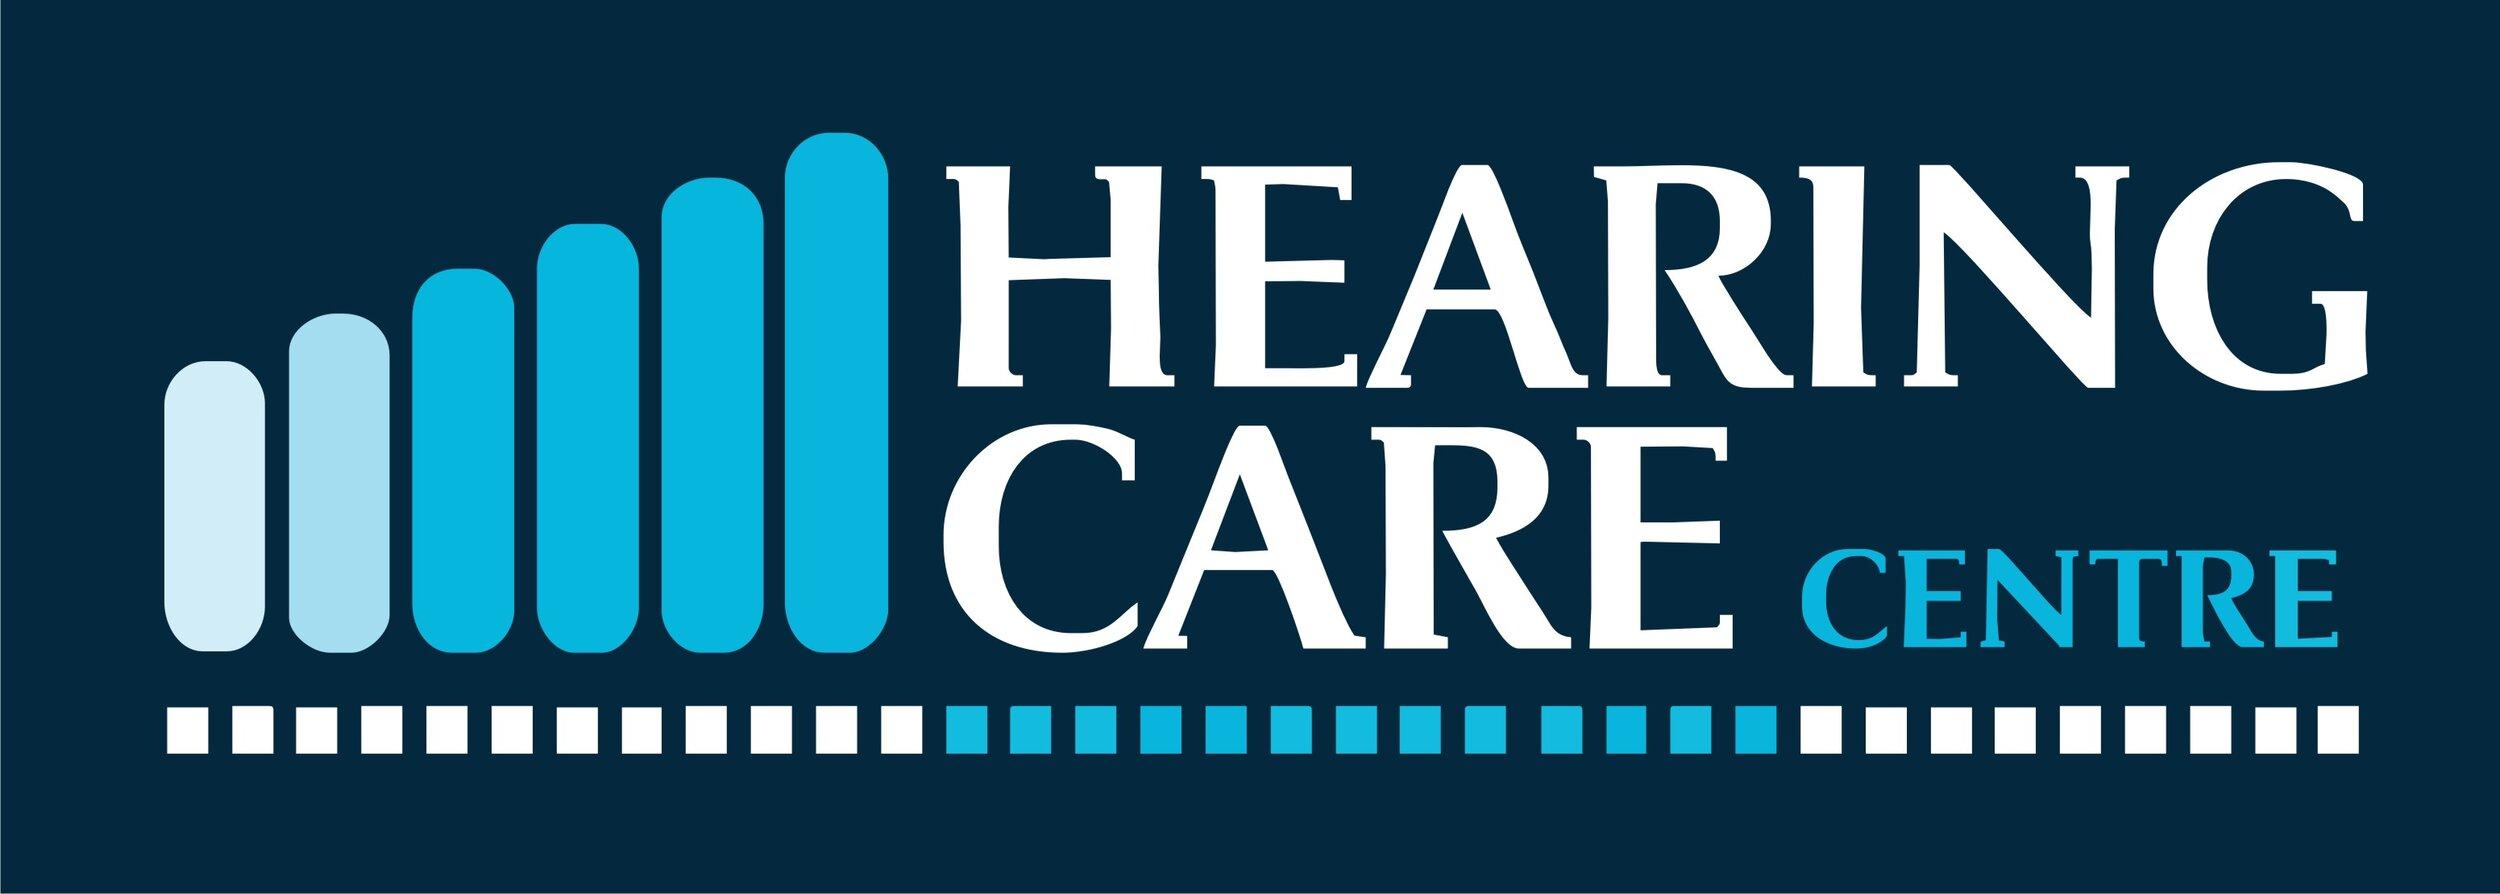 Hearing Care logo.jpg